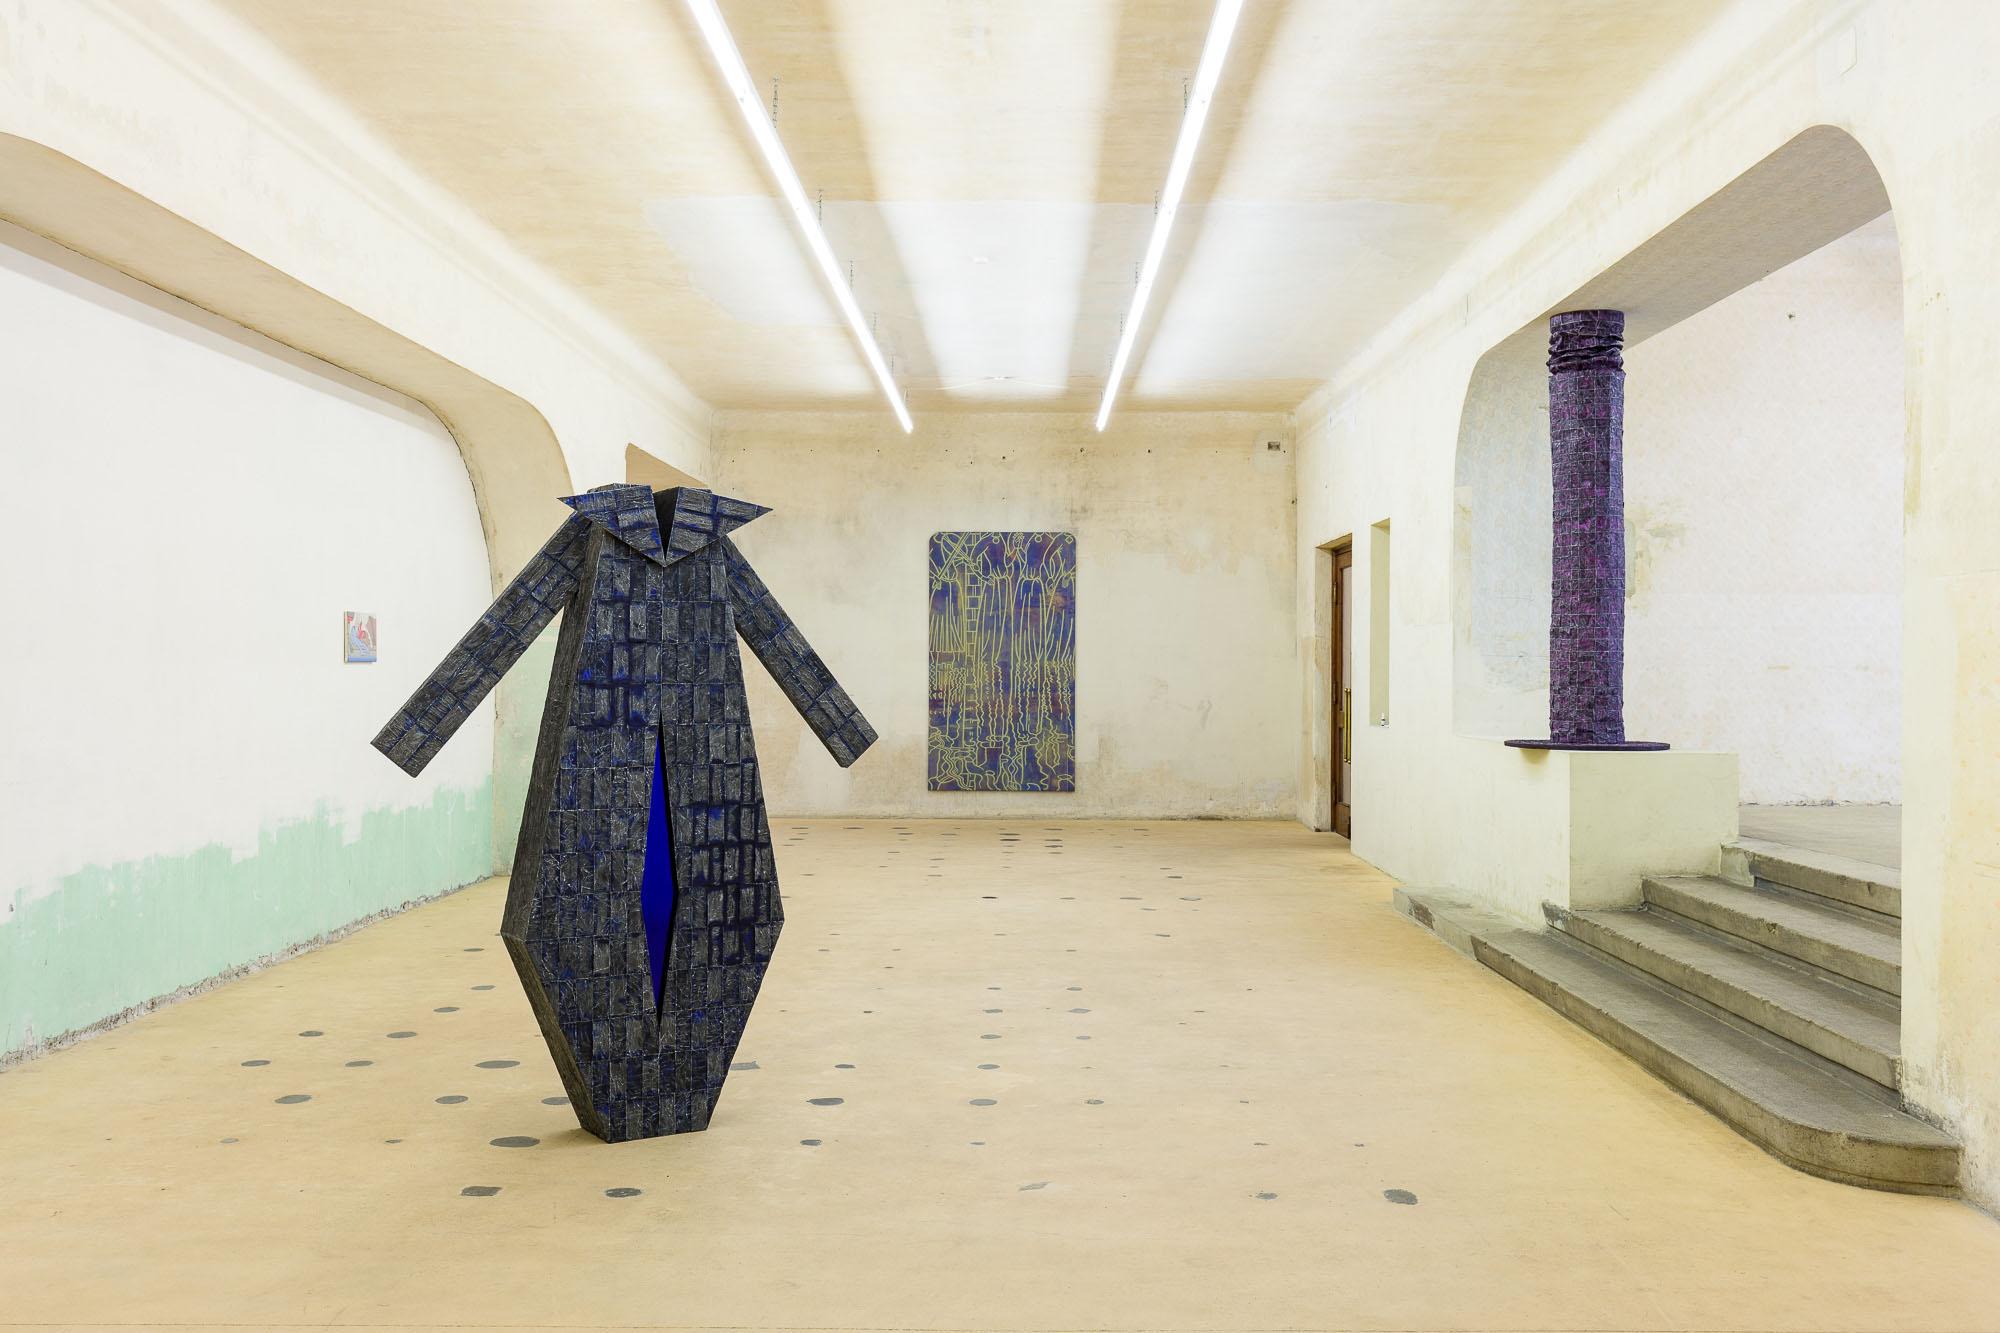 aaaa gallery, munchies art club, platform, online viewing room, katharina schilling, stine olgod, contemporary art, emerging artists